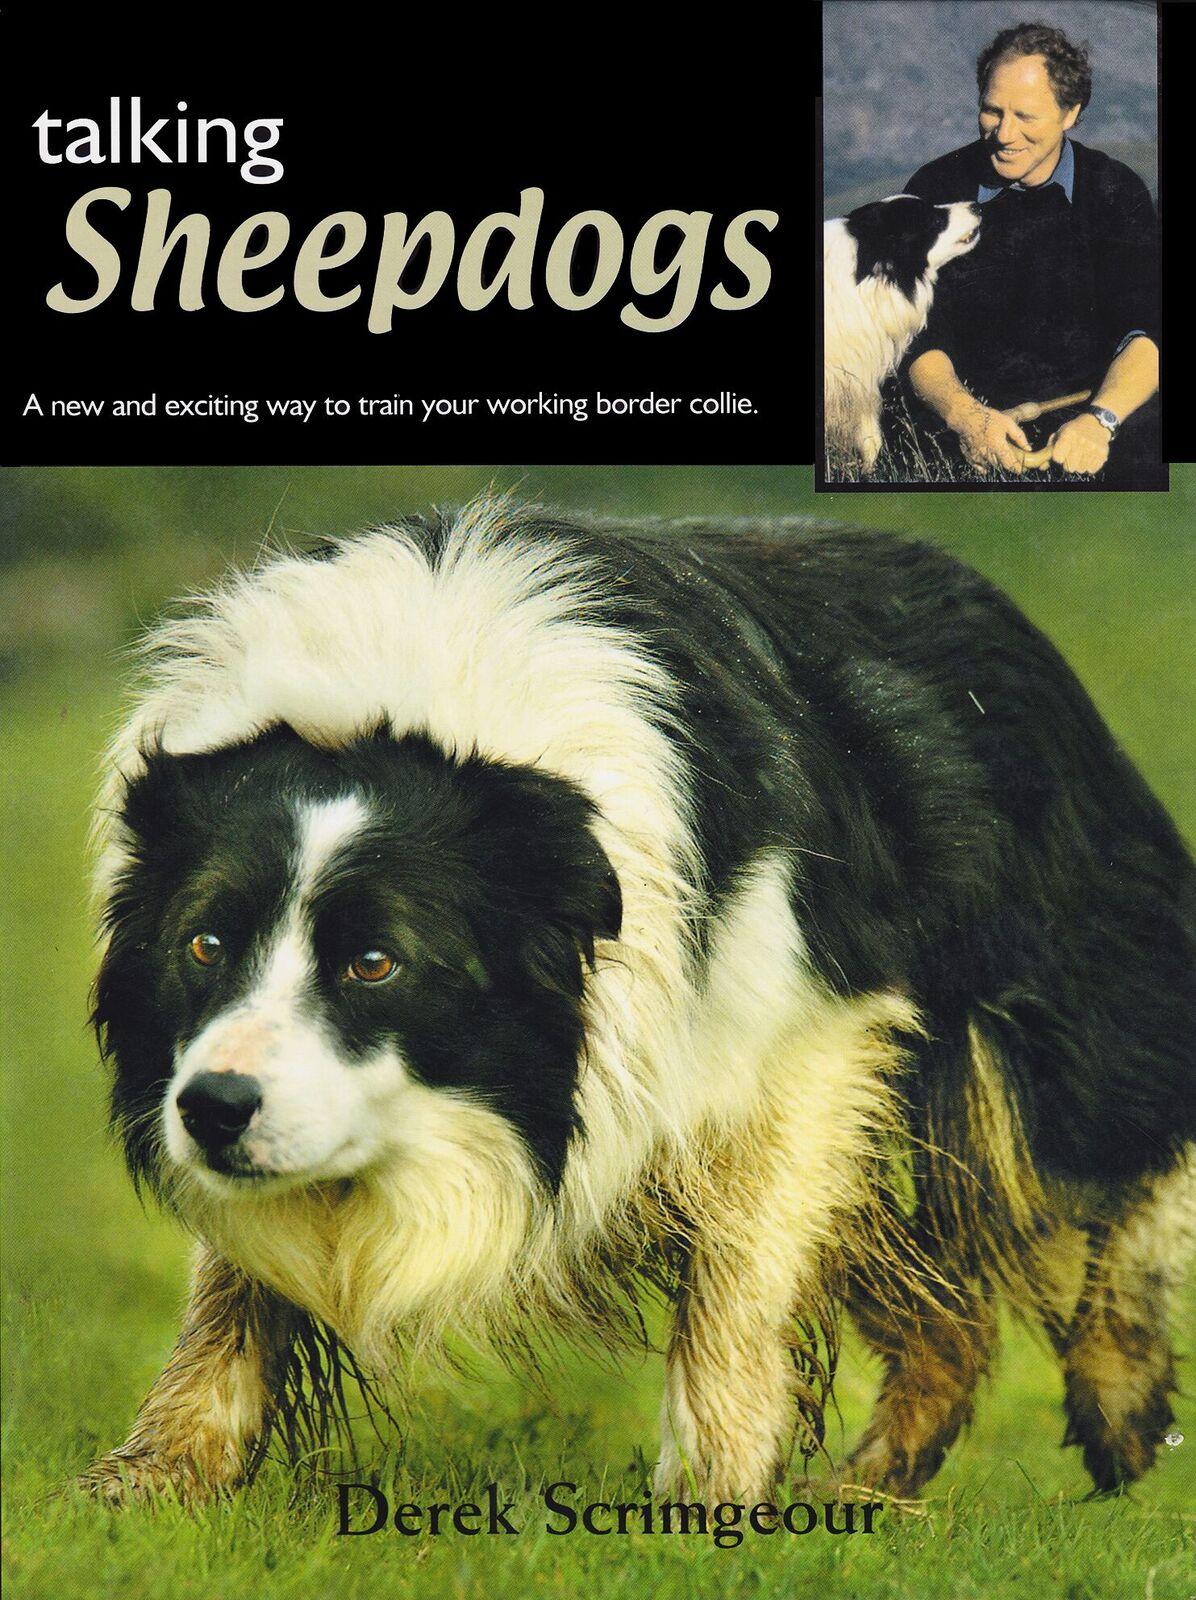 Talking sheep dogs